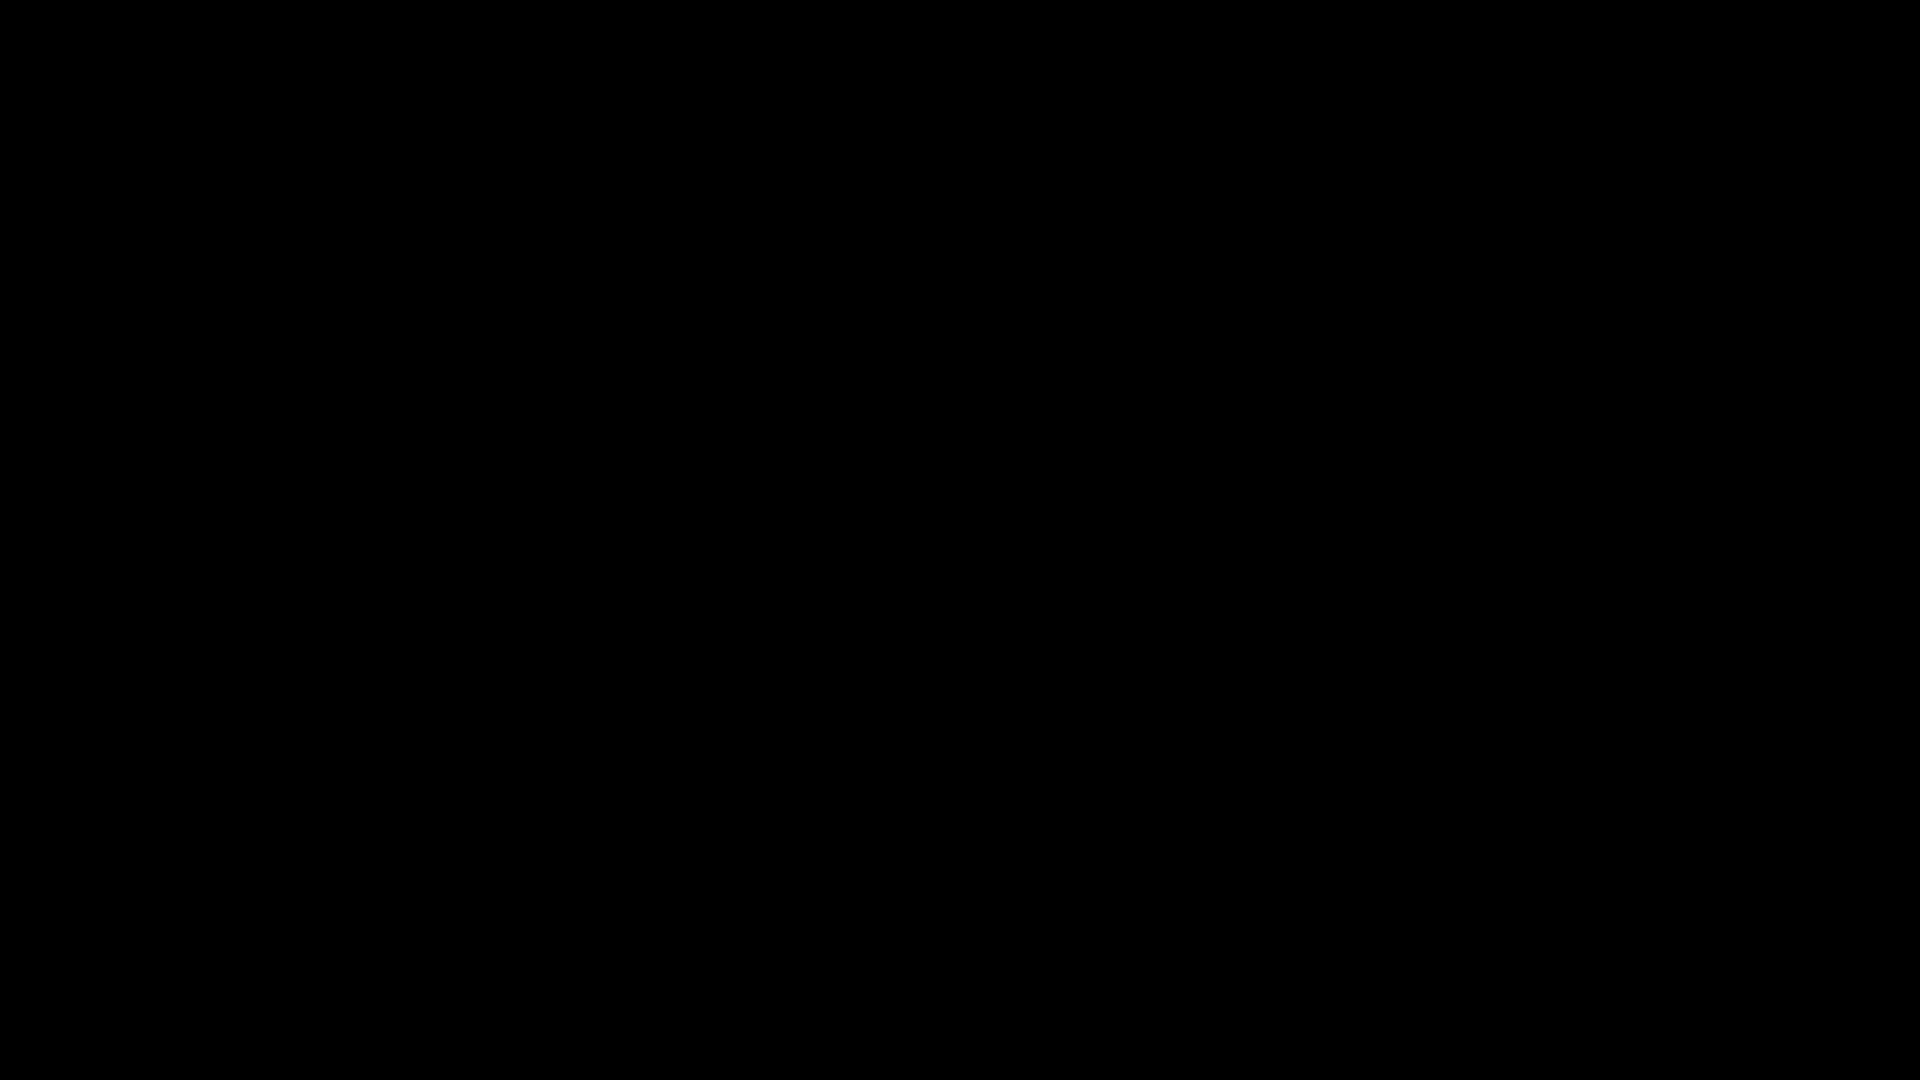 YVES ROUSSEAU QUINTET - MURMURES 2018